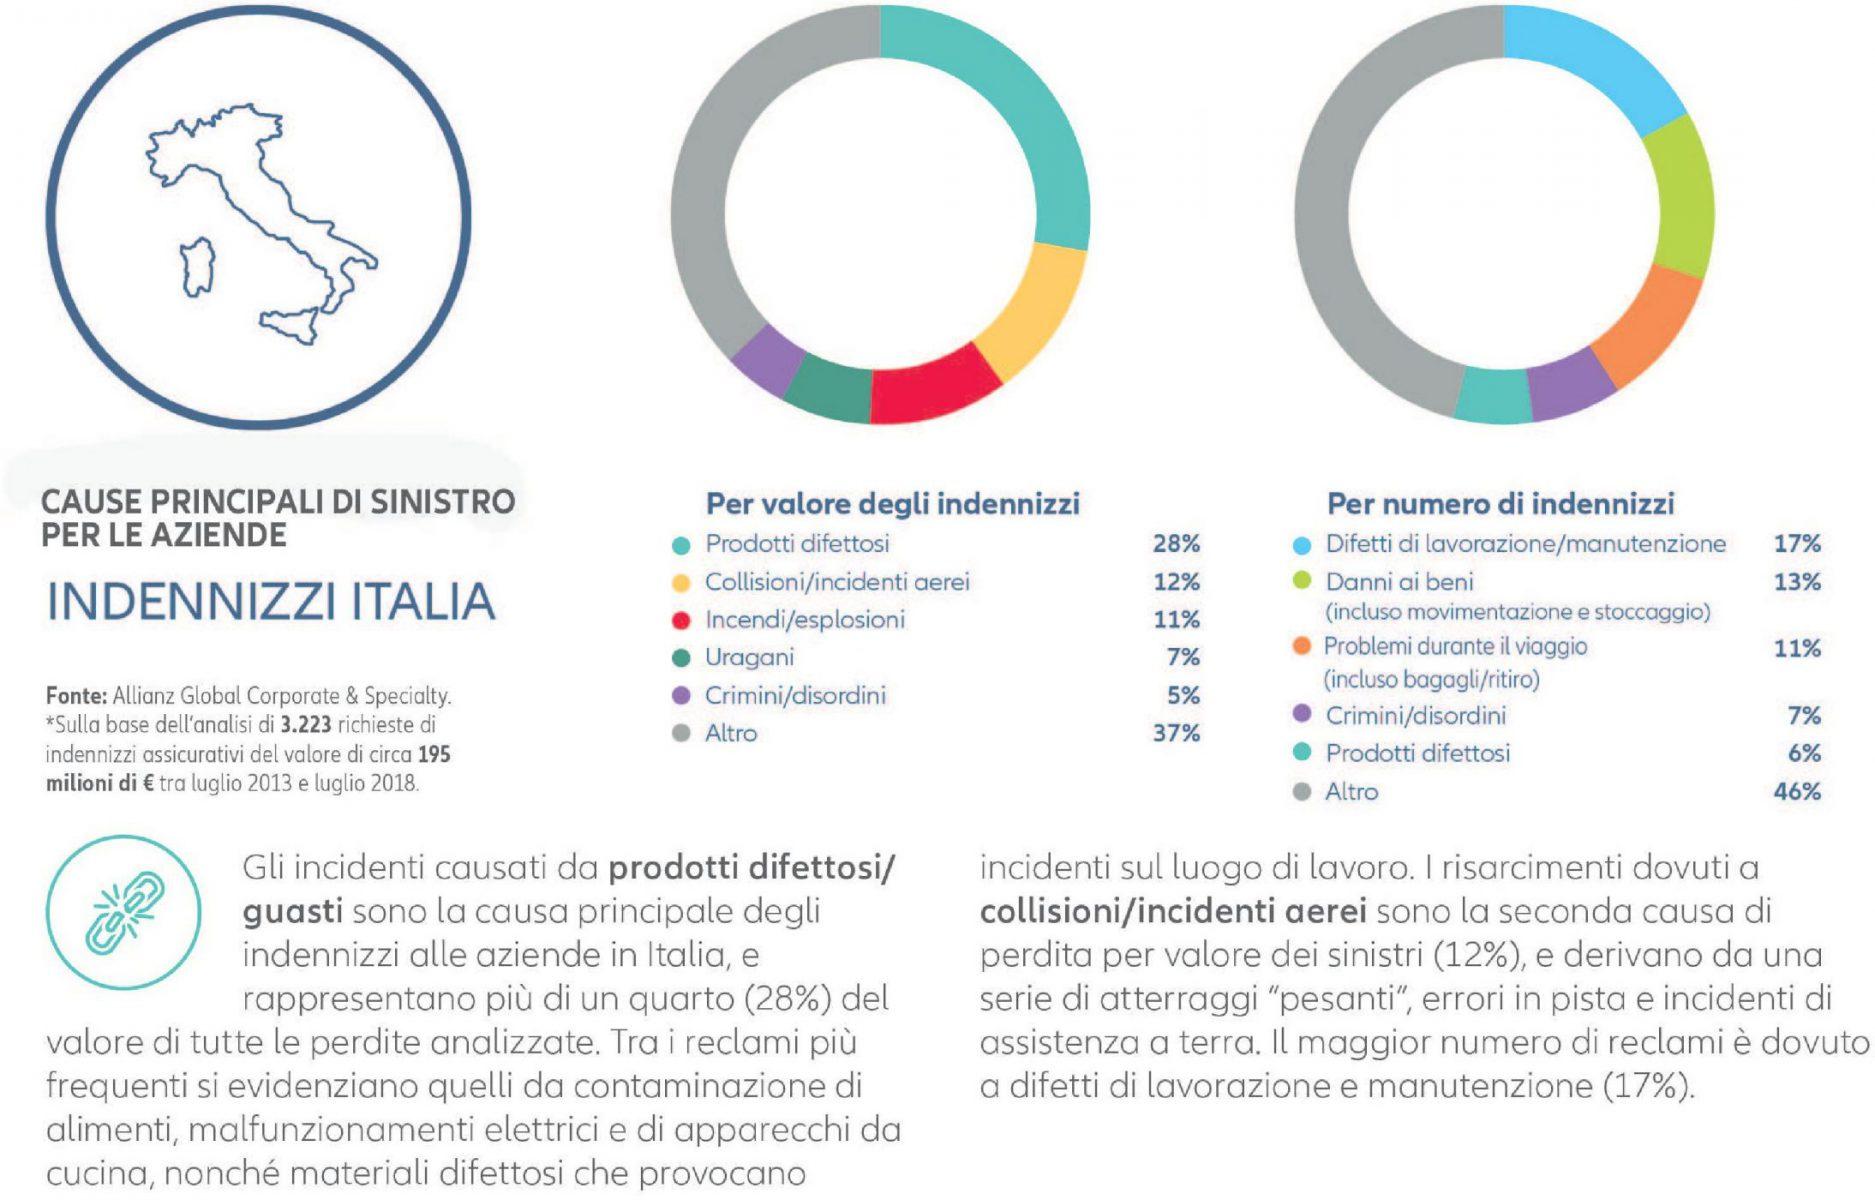 AGCS - Cause principali sinistri Italia Imc